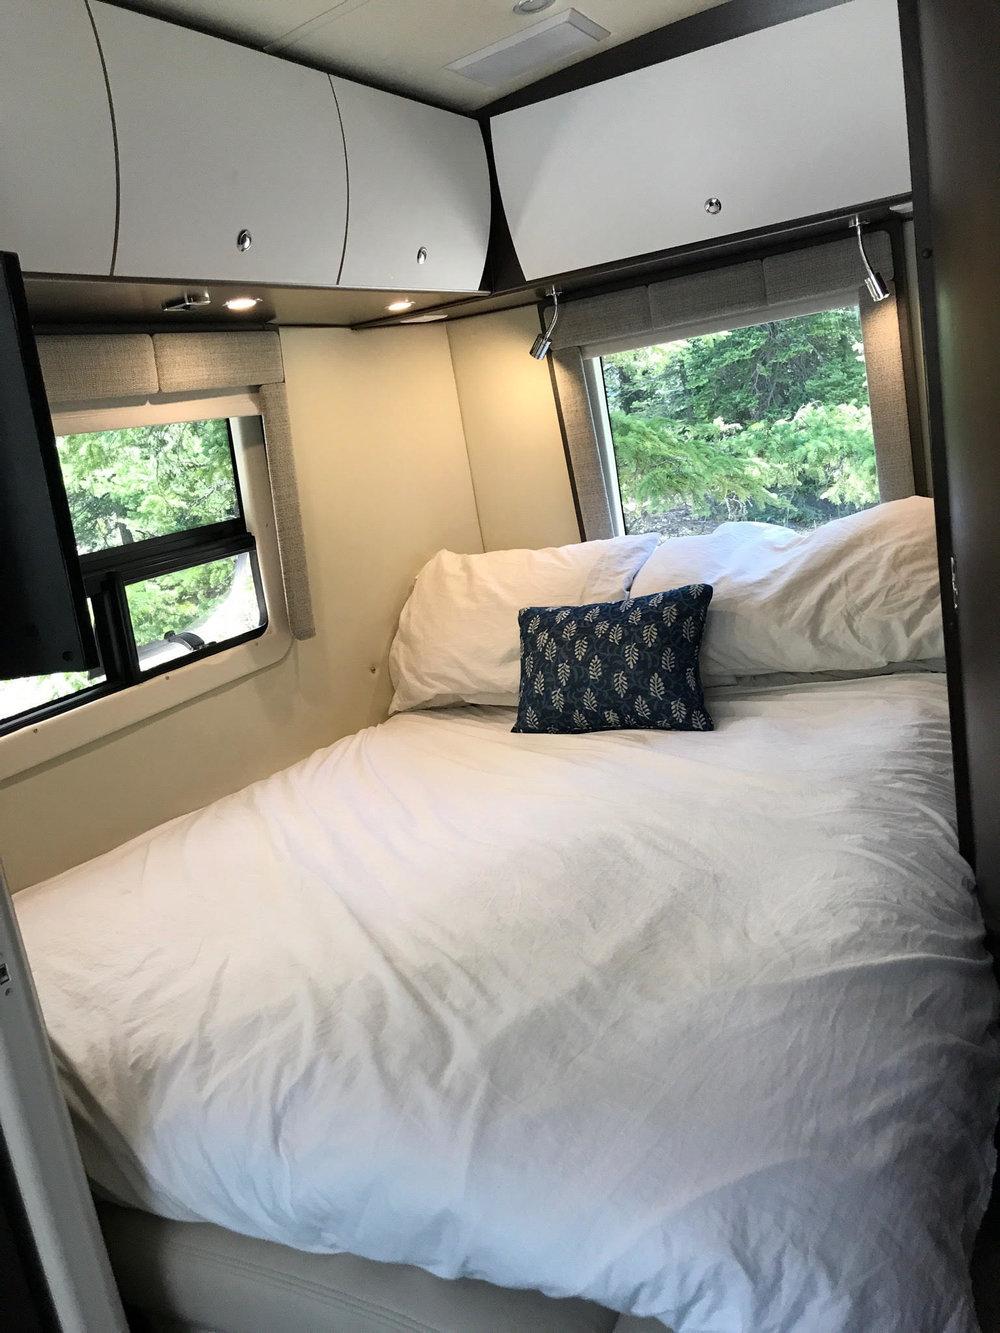 Futon Topper Serenity Bed.jpg